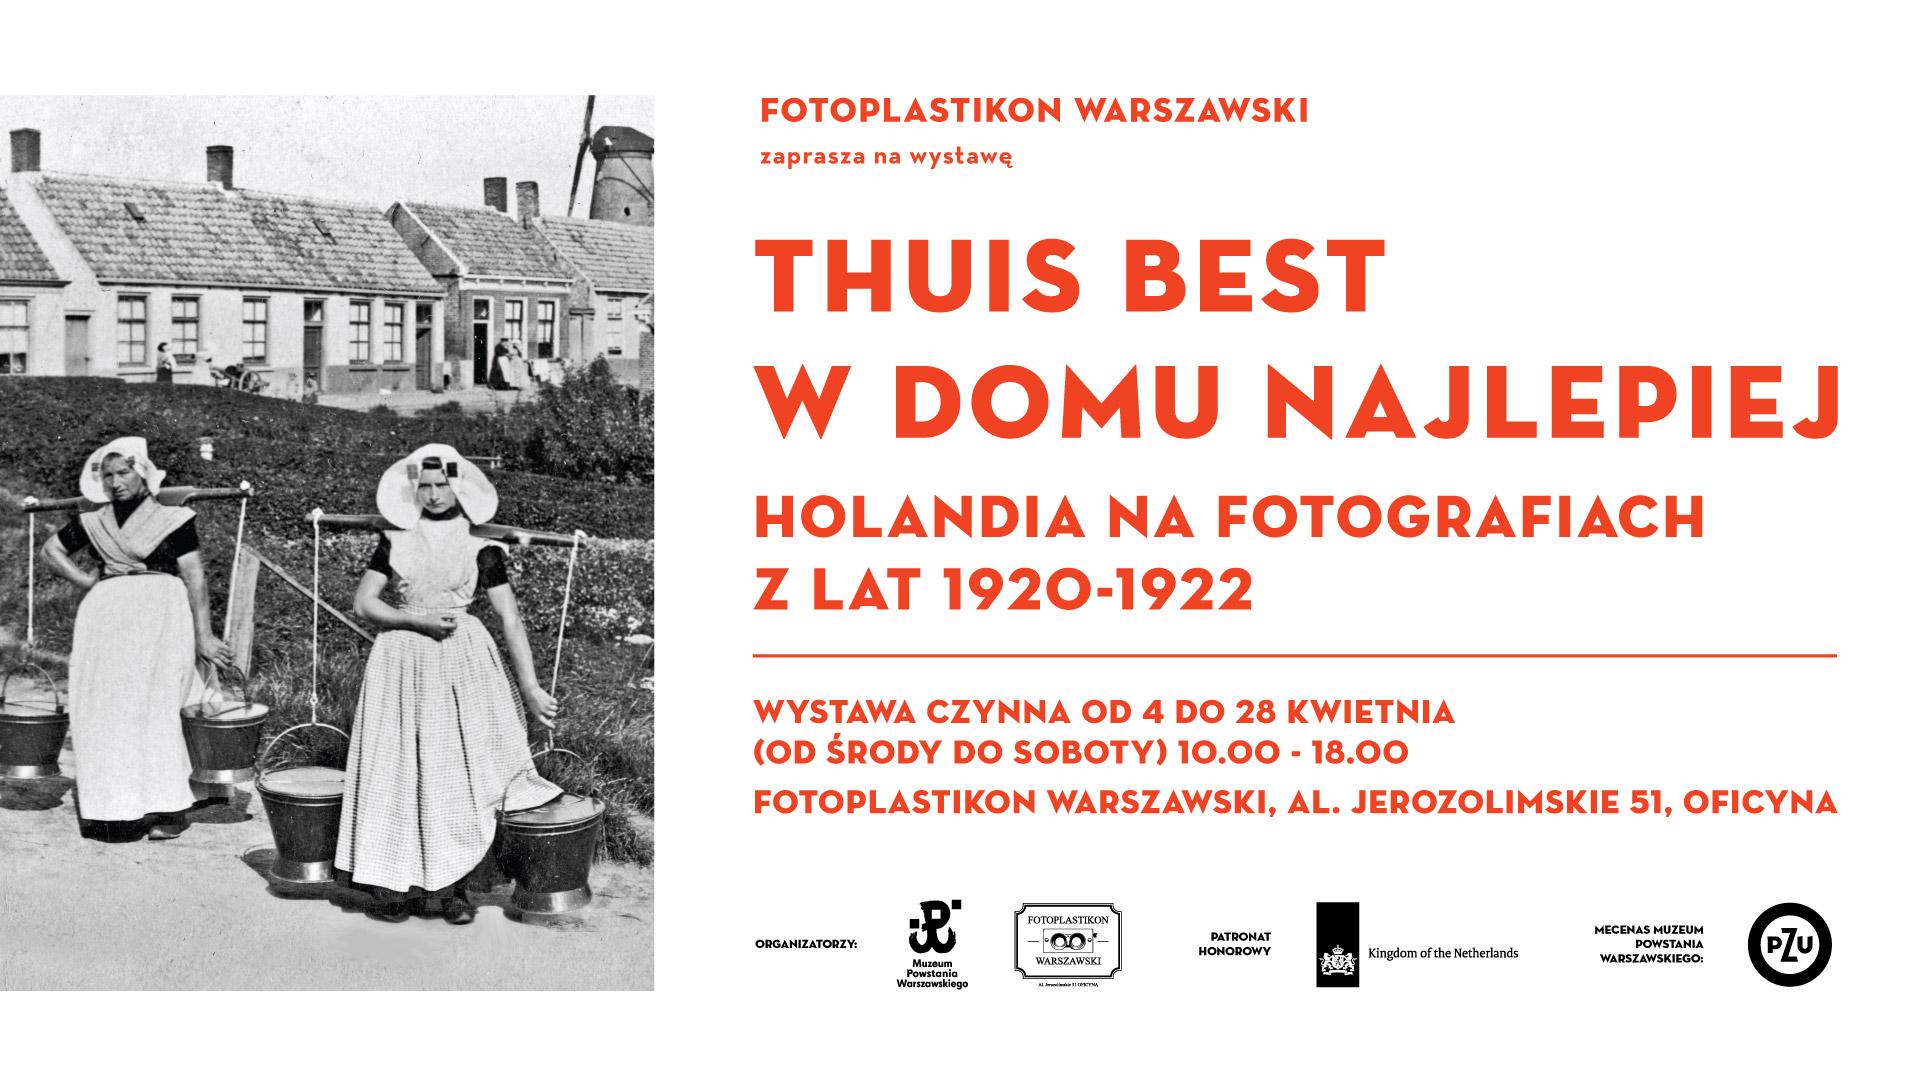 Fotoplastikon-Holandia-FB-1920x1080-v2